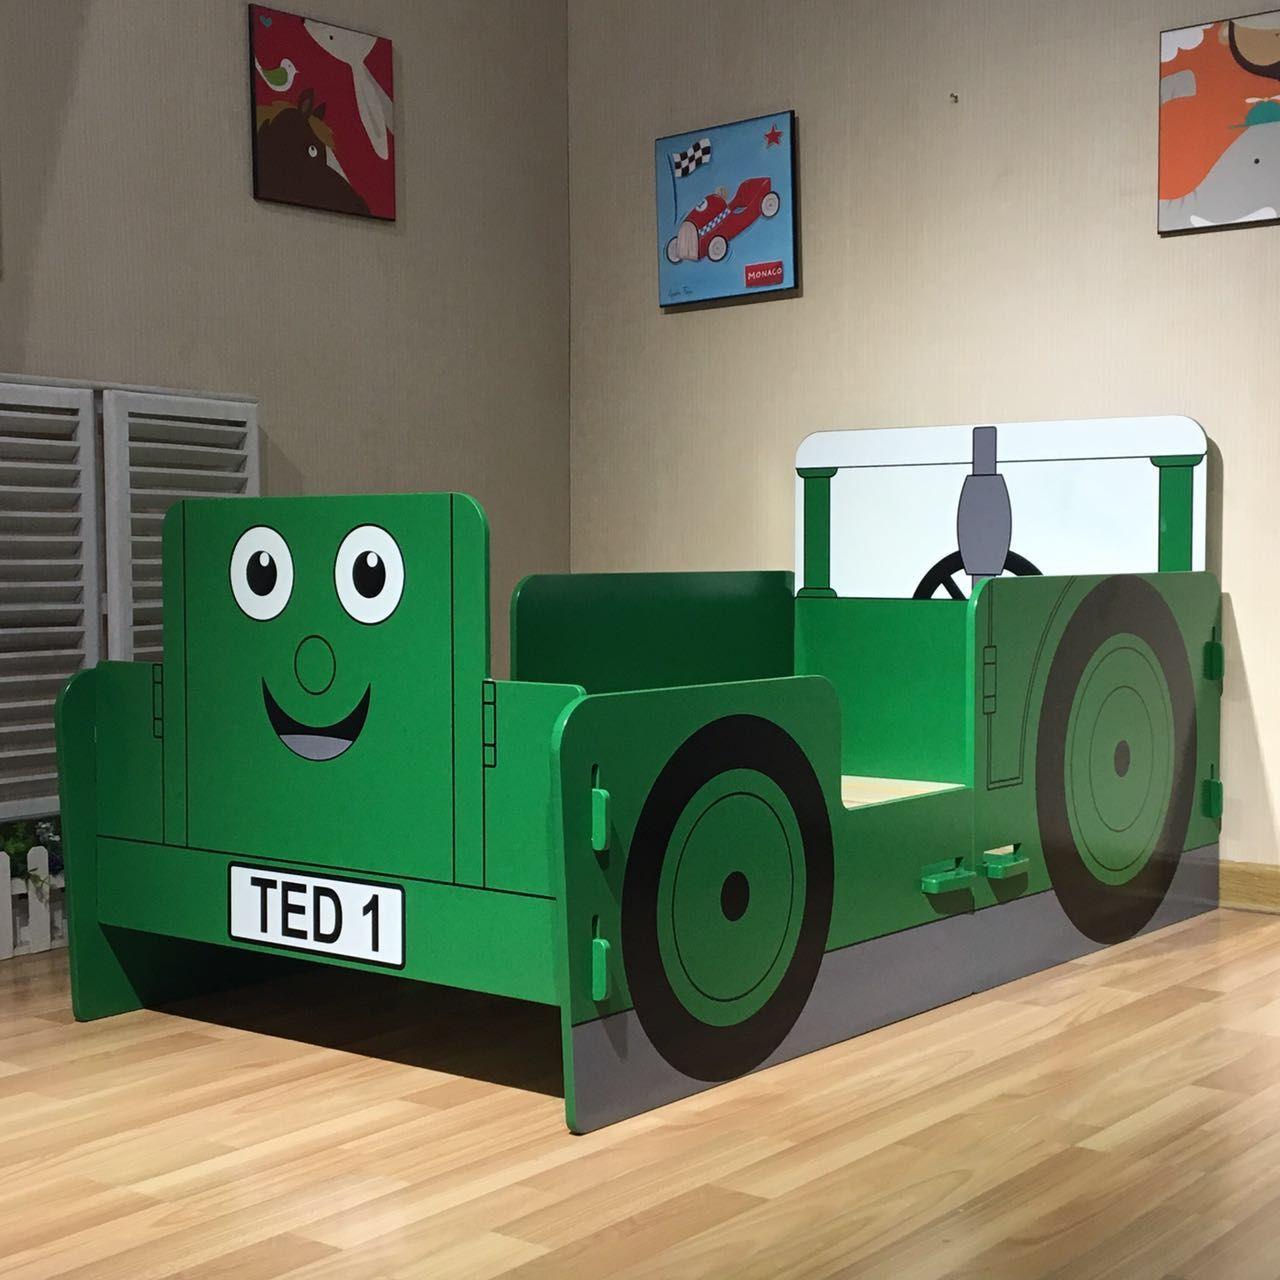 Tractor Ted Bed Side Click Visit Below For More Information Tractor Tractorted Boy Girl Bed Green T Betten Fur Kinder Kinder Bett Coole Kinderbetten